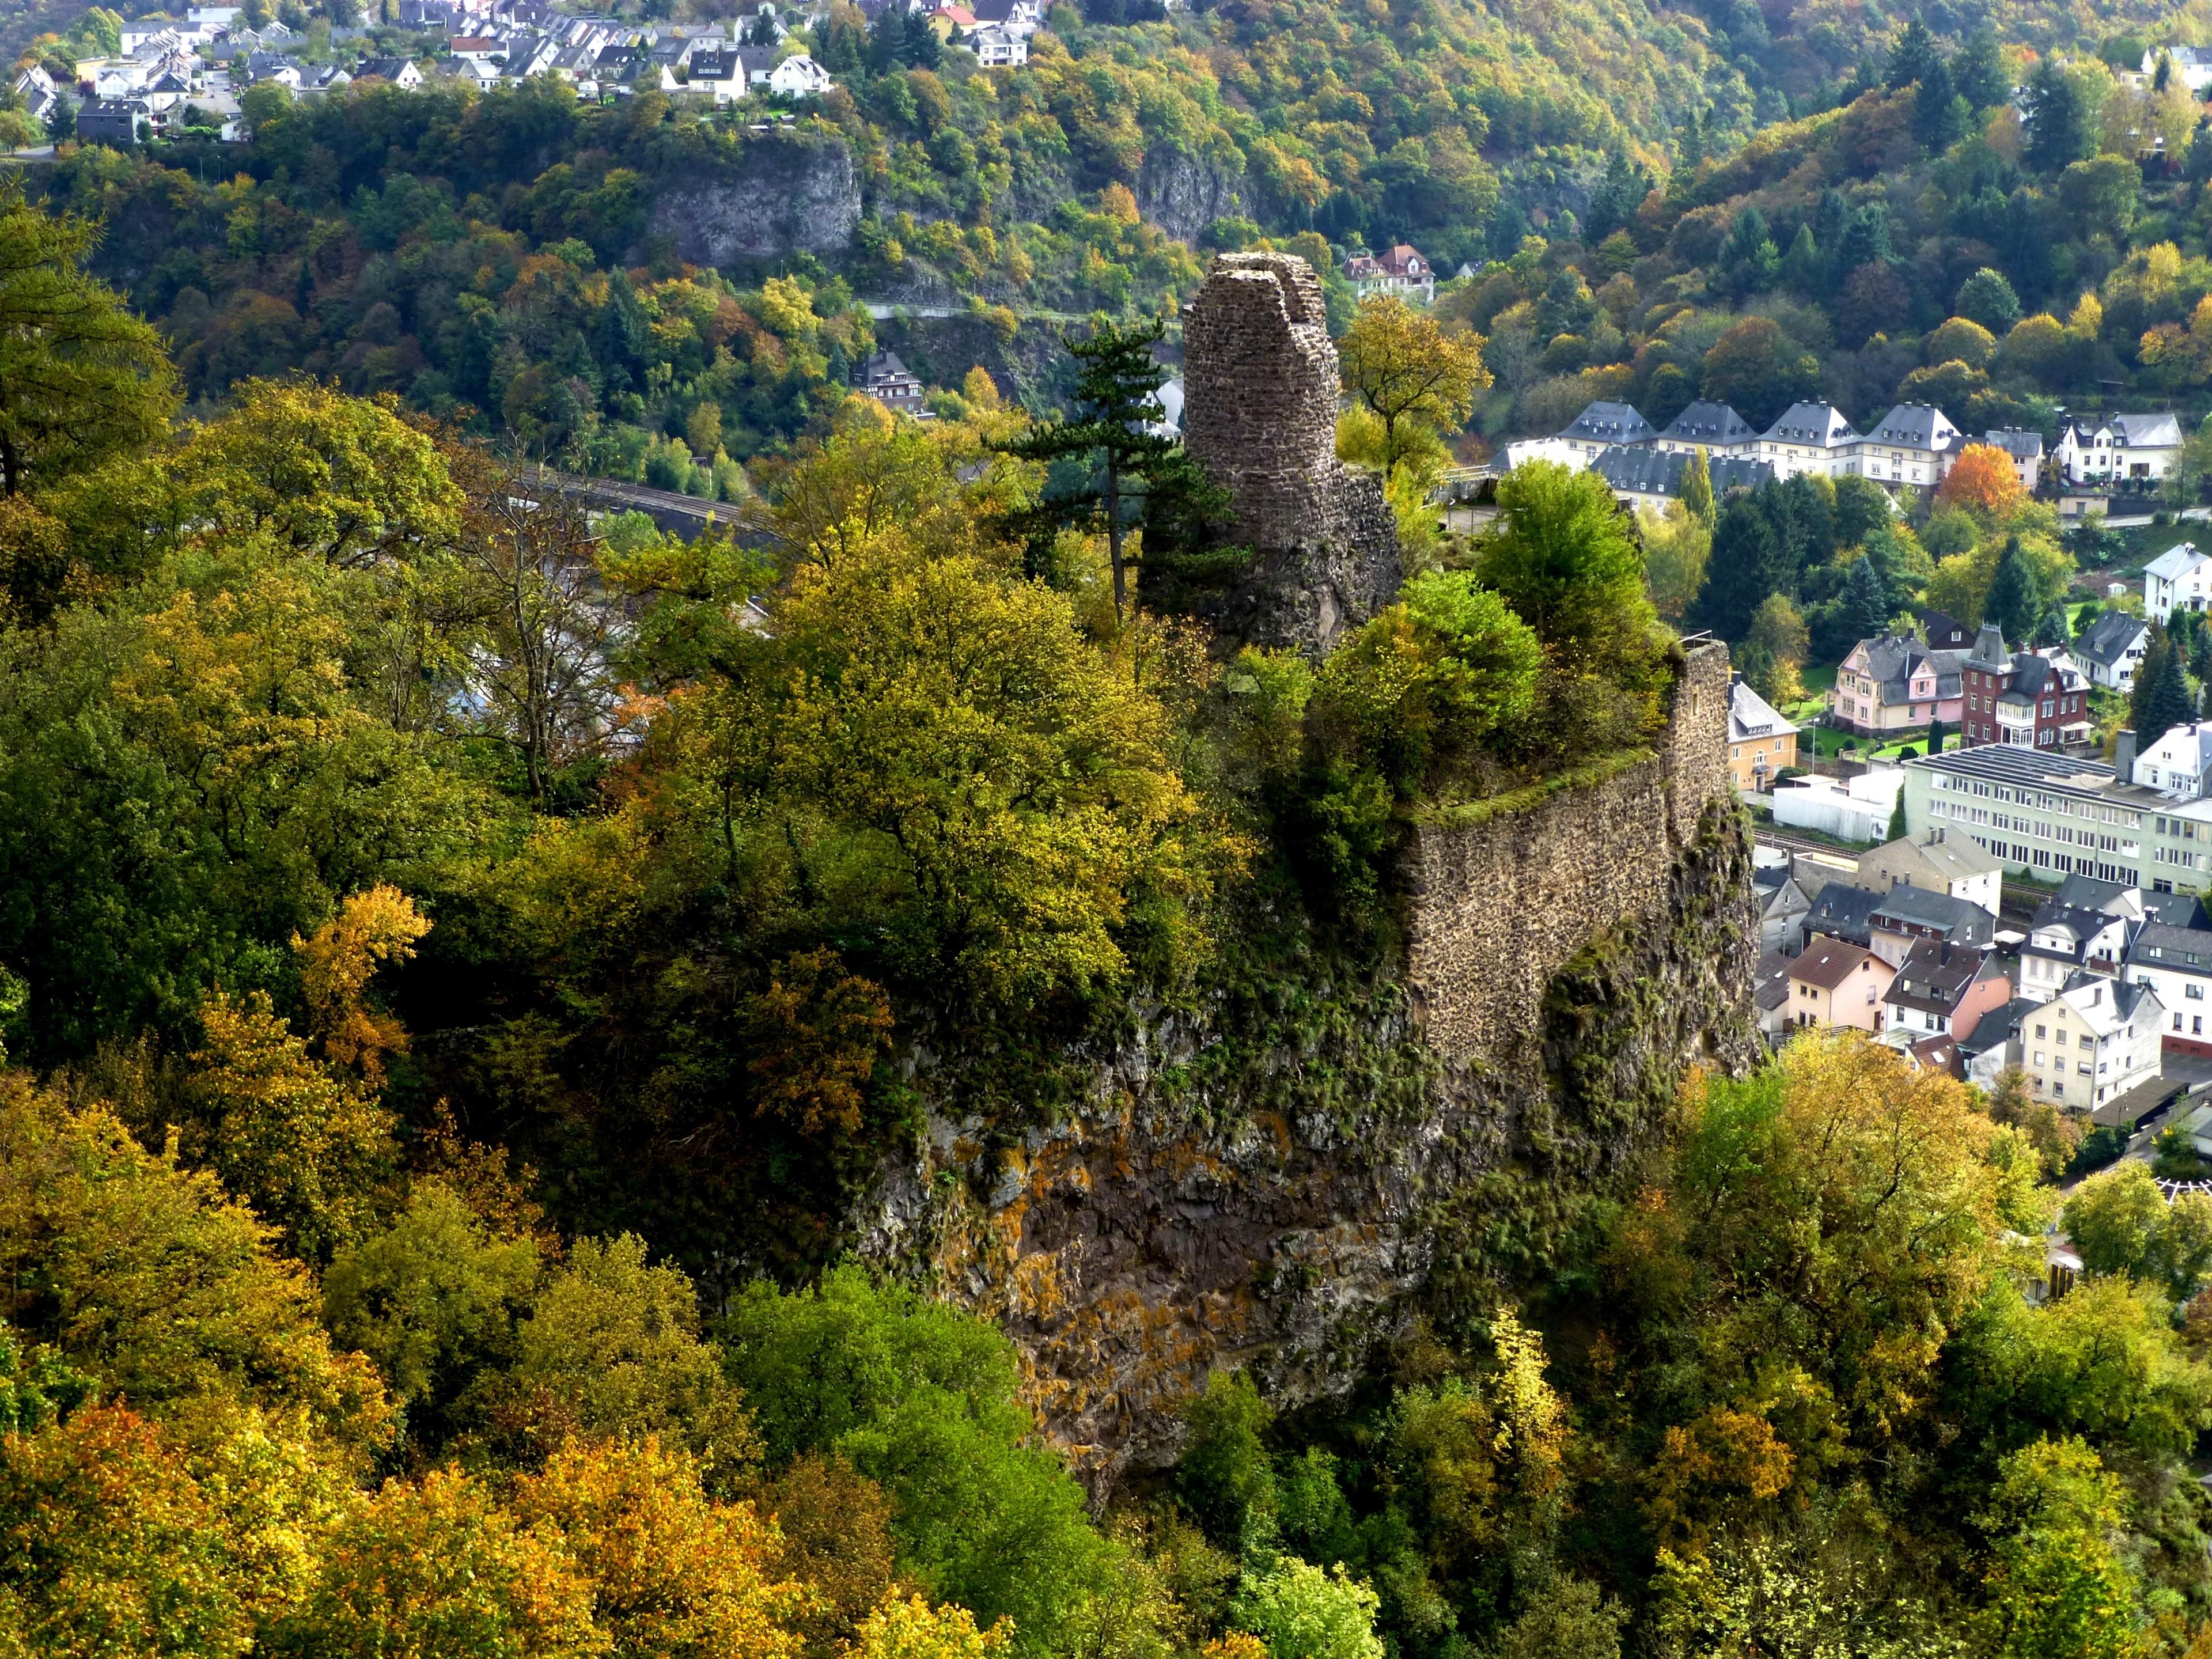 Idar-Oberstein, Rhineland-Palatinate, Germany